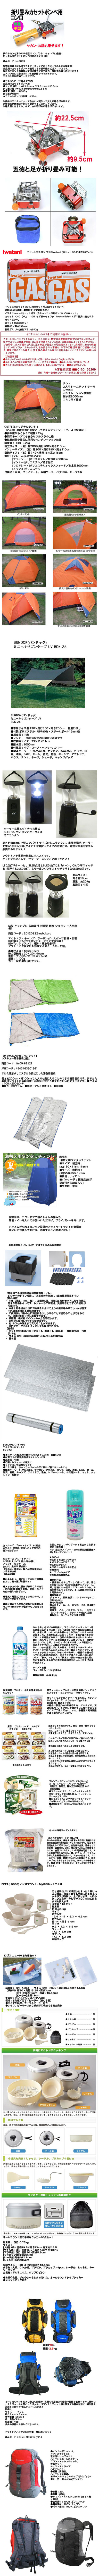 img_20120321-085119.jpg